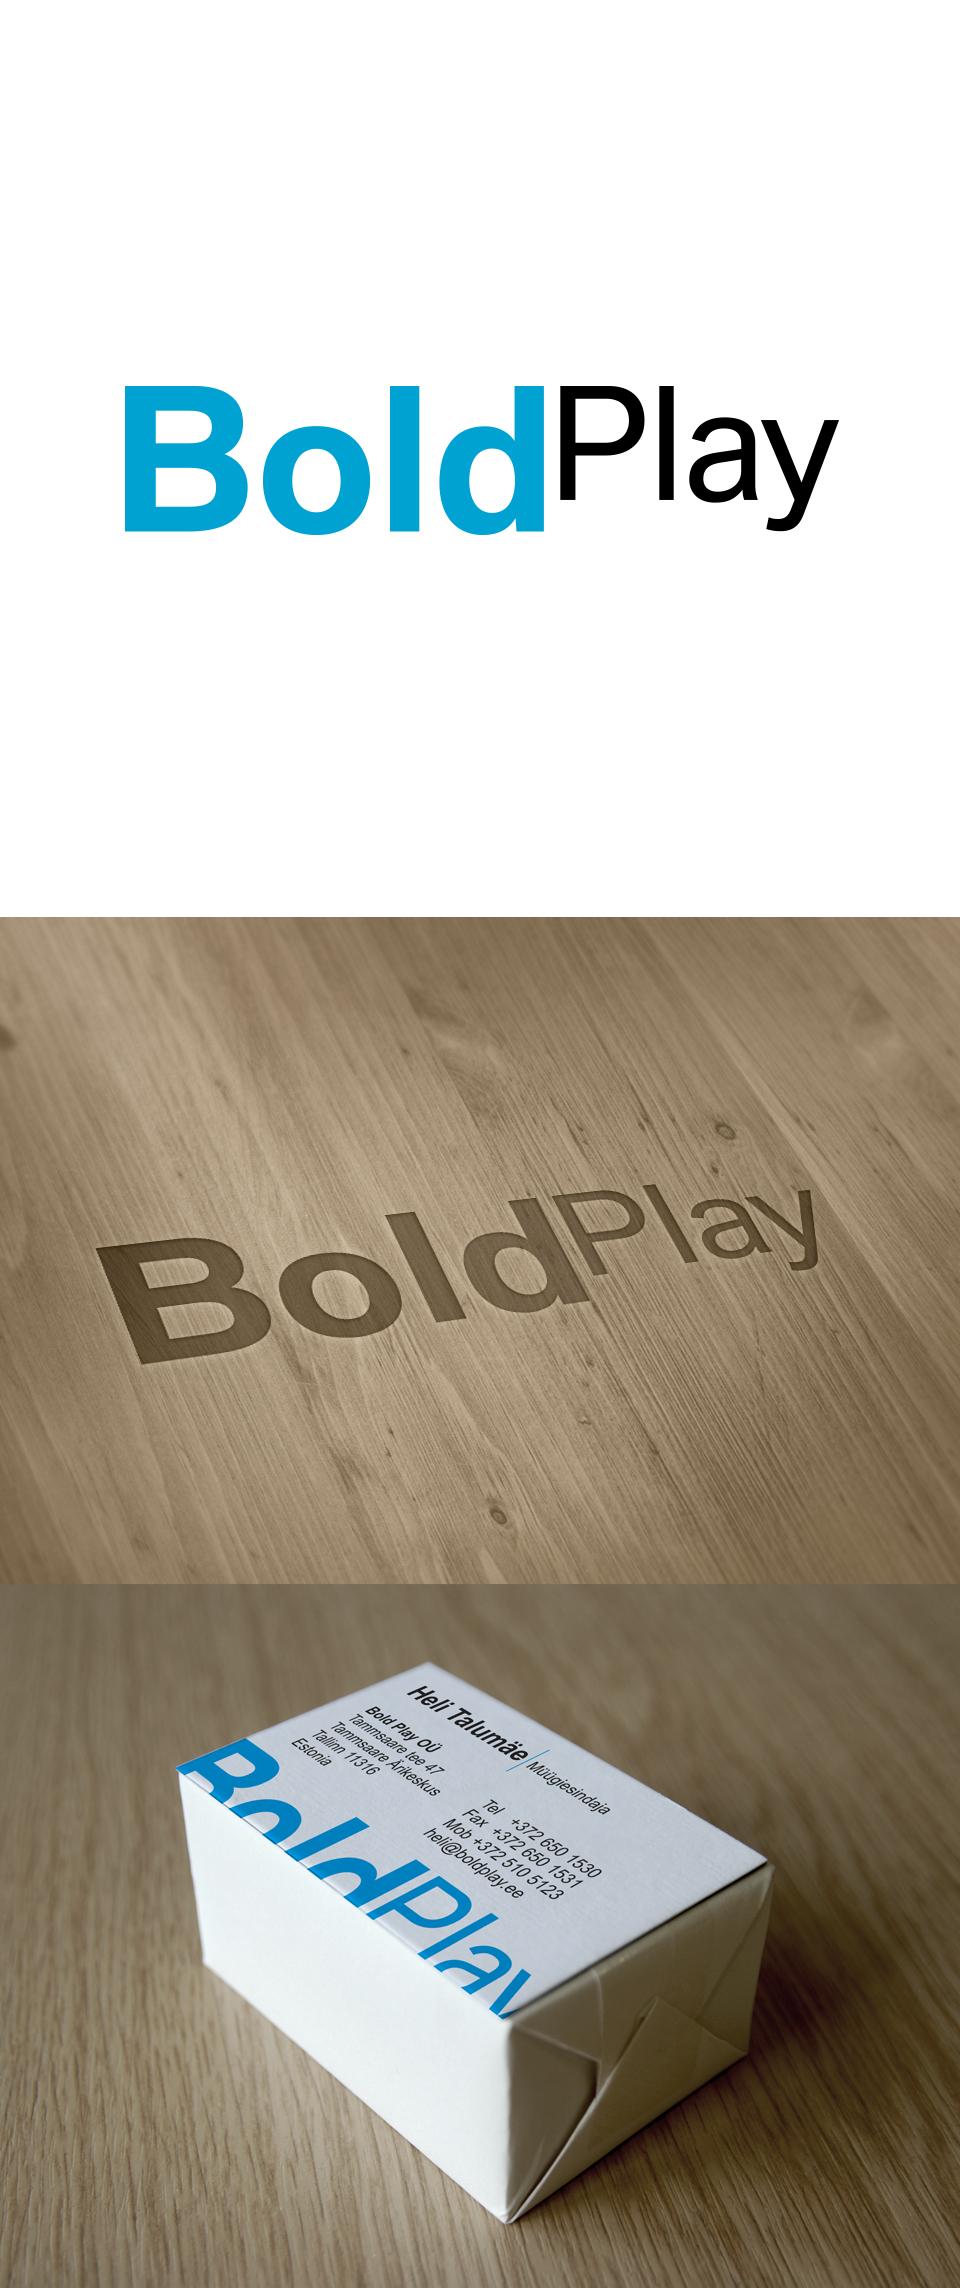 BoldPlay